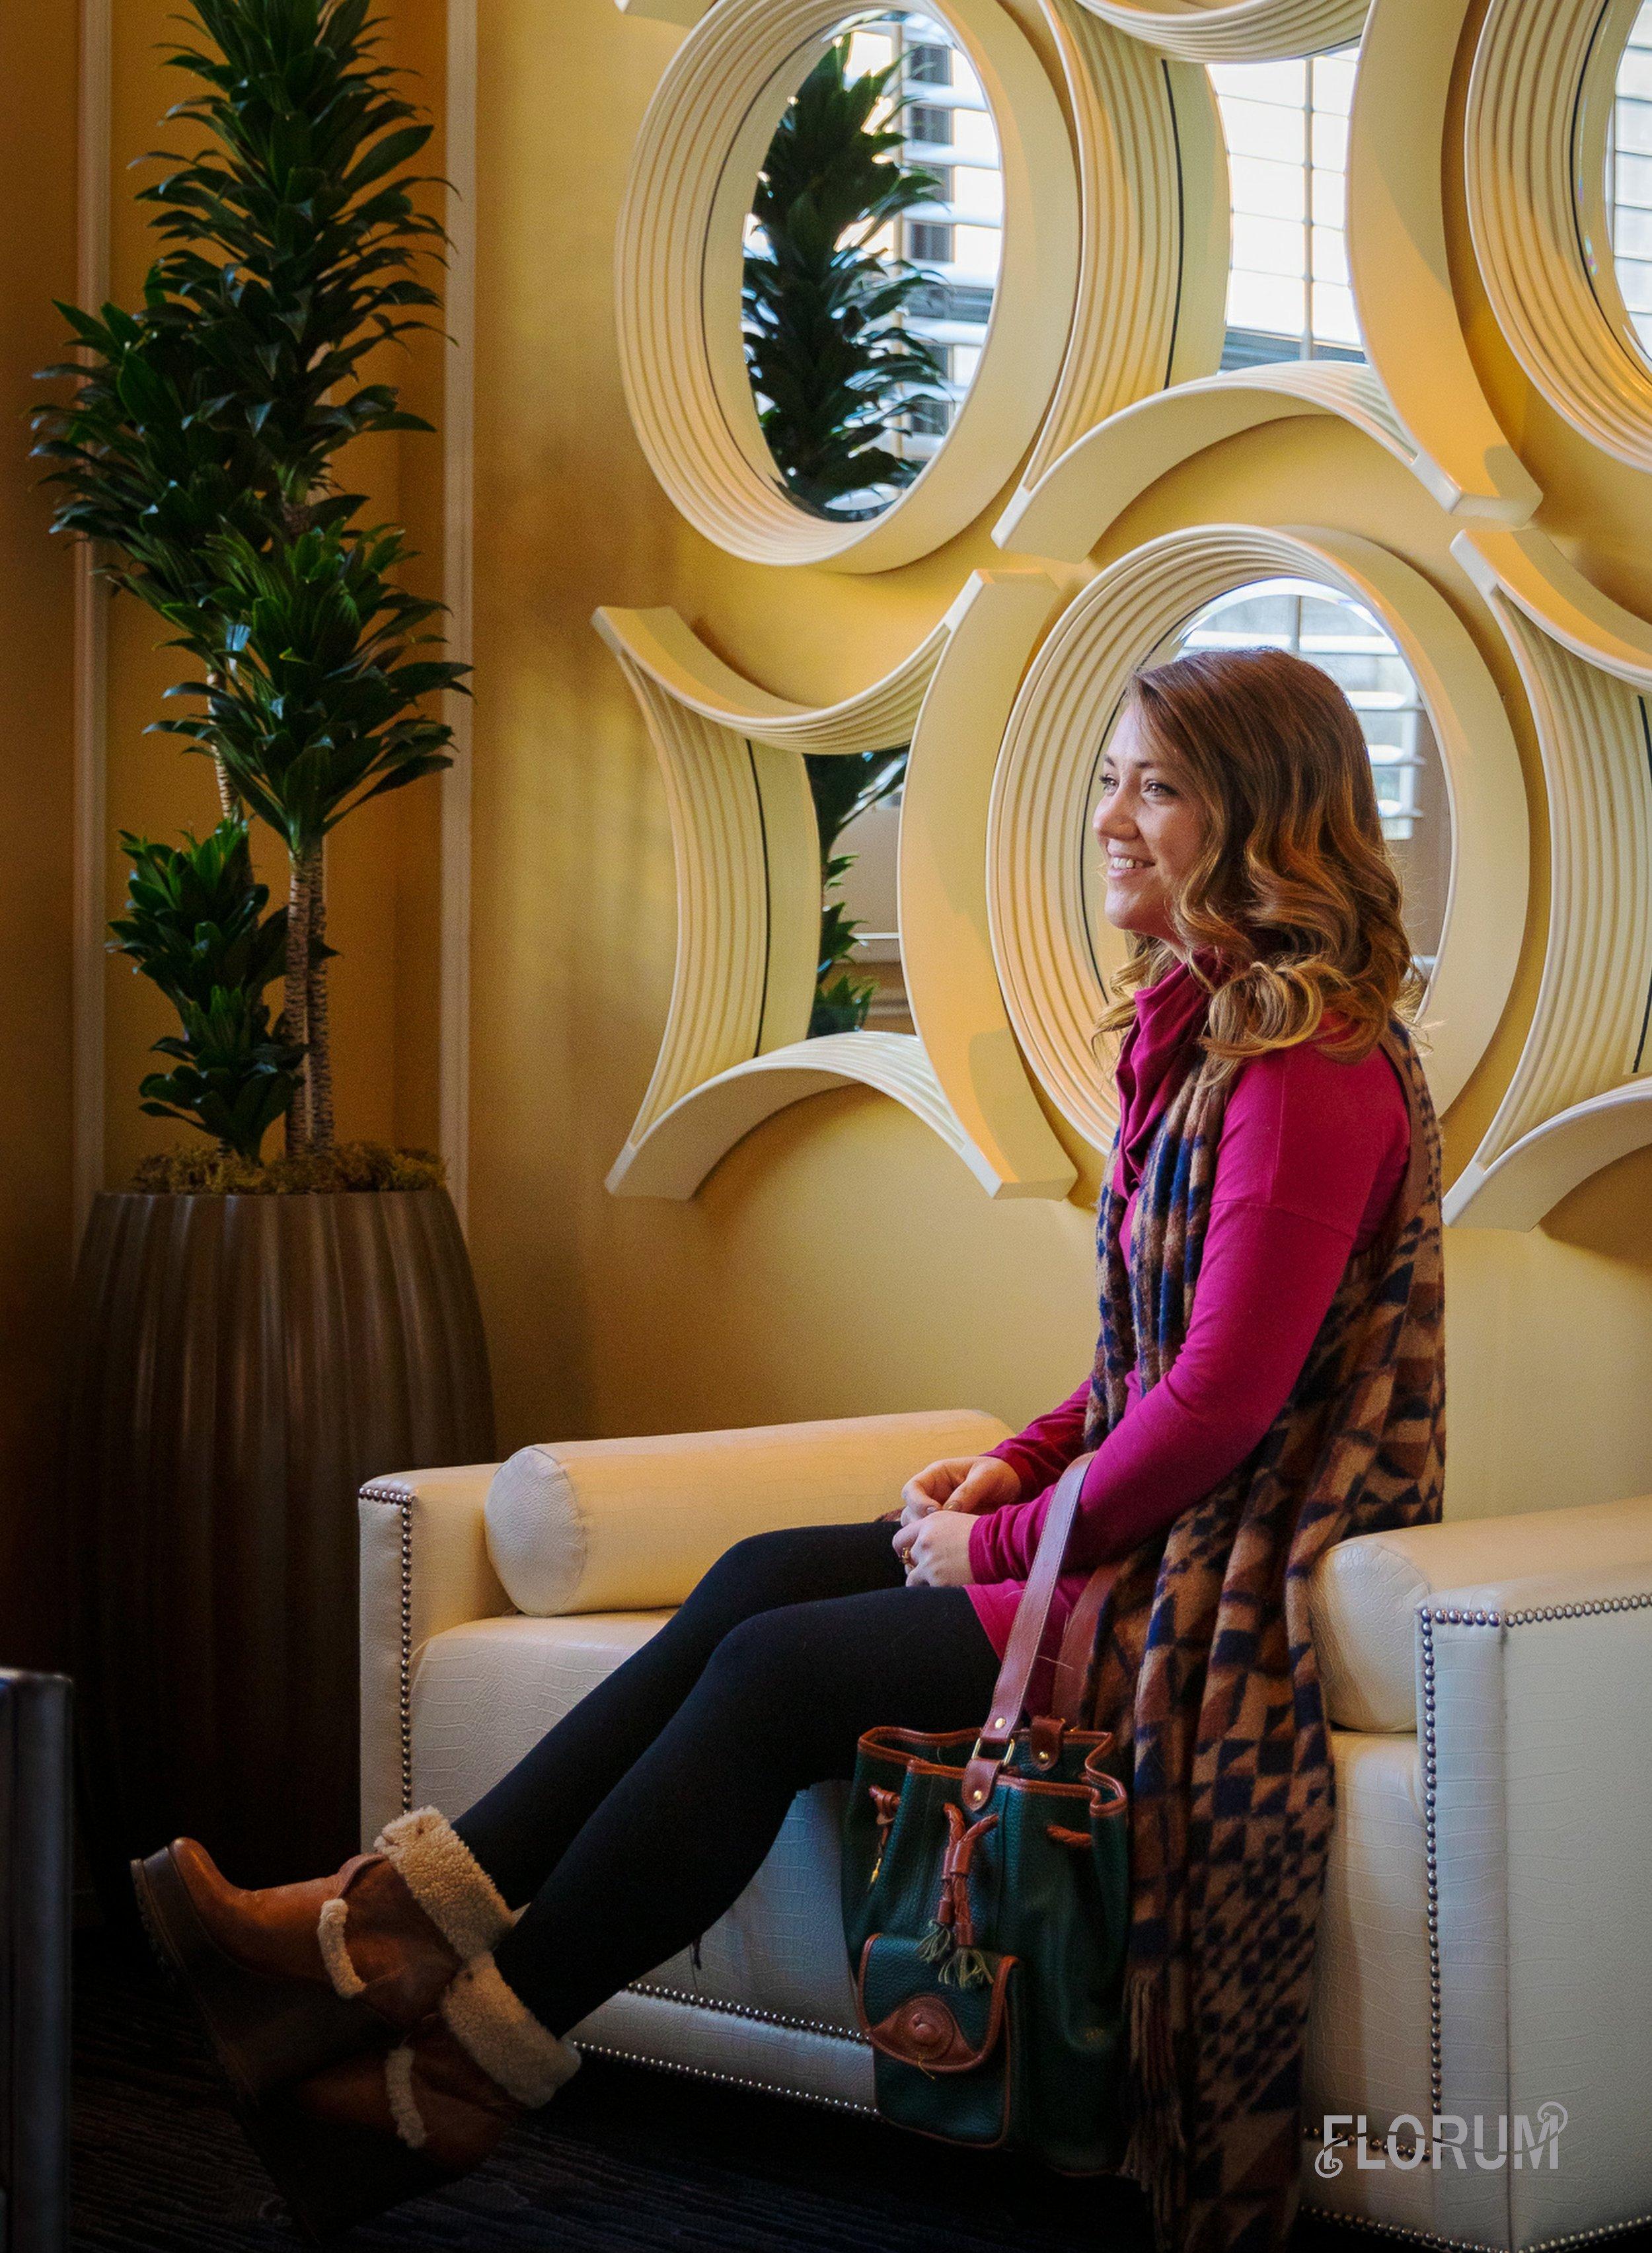 Salt Lake City - Hotel Monaco - Florum Fashion Magazine - Bobby Swingler - Ethical winter fashion - eco travel - noelle lynne - Fig Organic Clothing.jpg